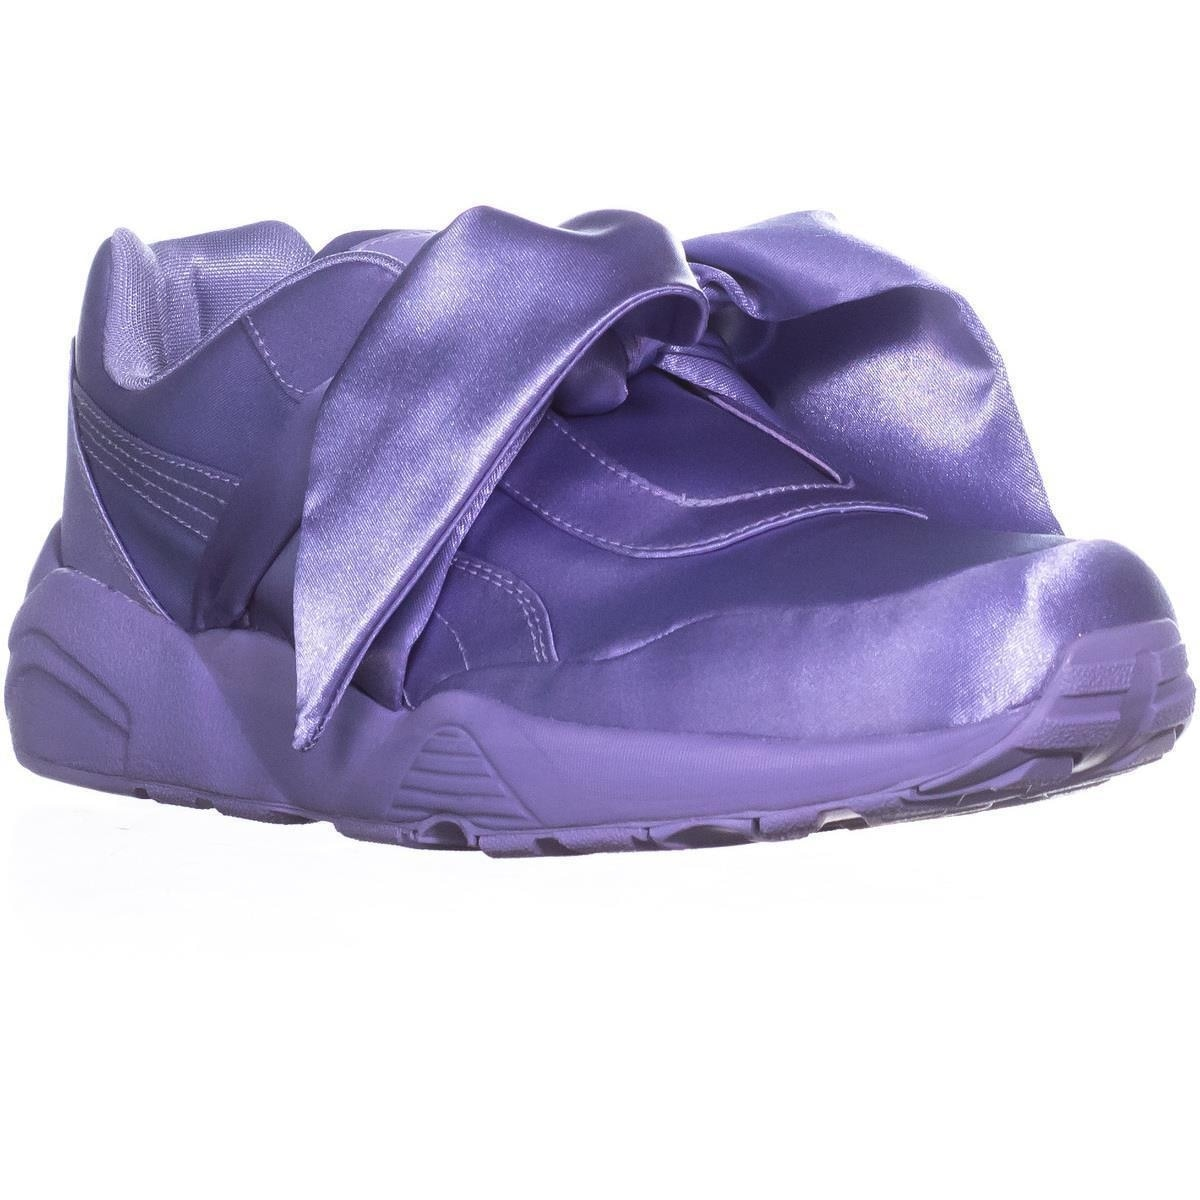 best service 0cbef eb0f8 PUMA Bow Sneaker Fenty Rihanna Fashion Sneakers, Sweet Lavender